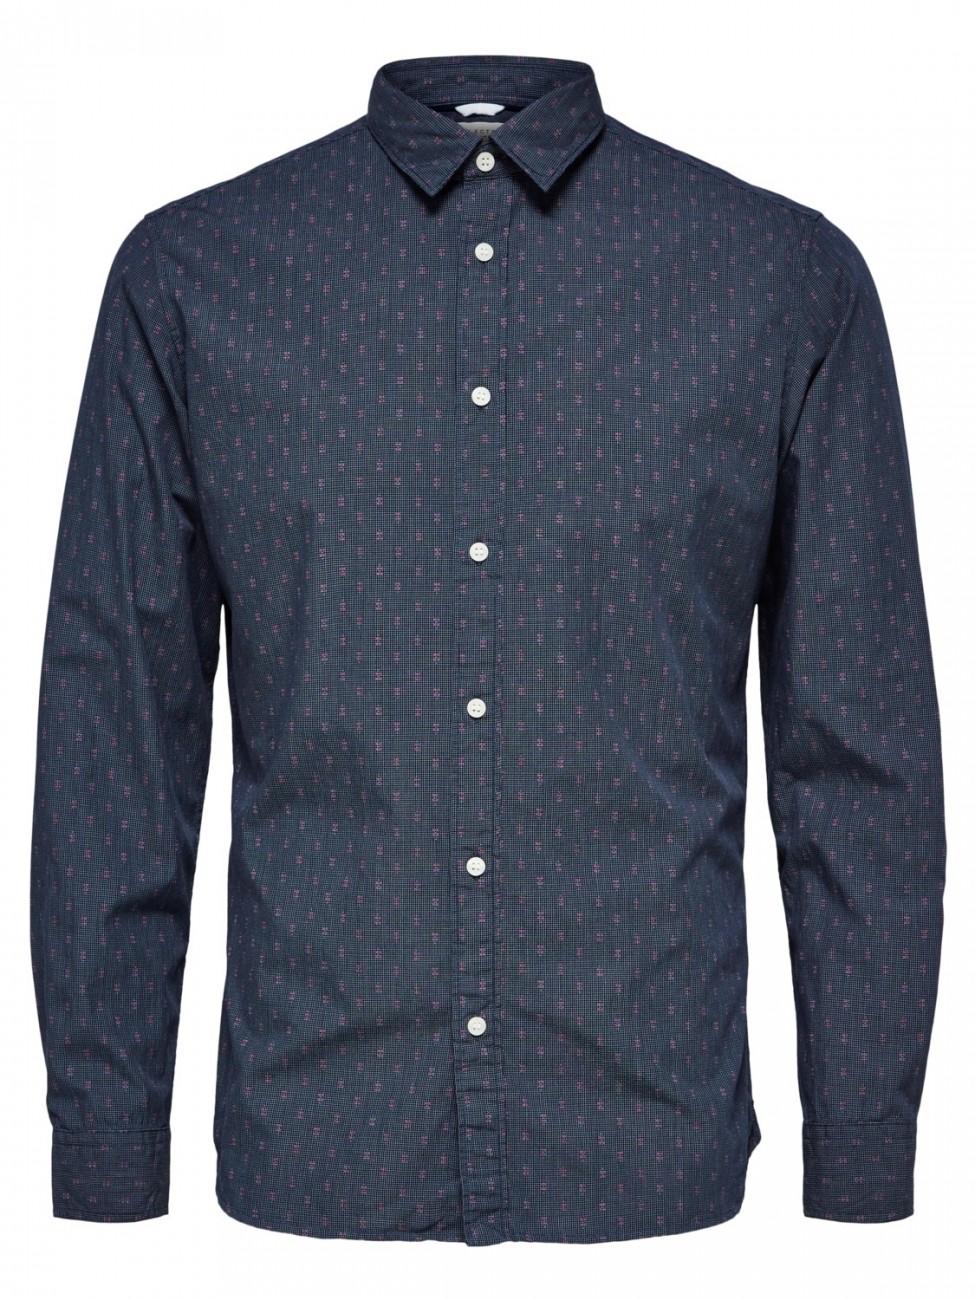 SELECTED-Hombre-Camisa-Informal-shhonemoonie-Camiseta-LS